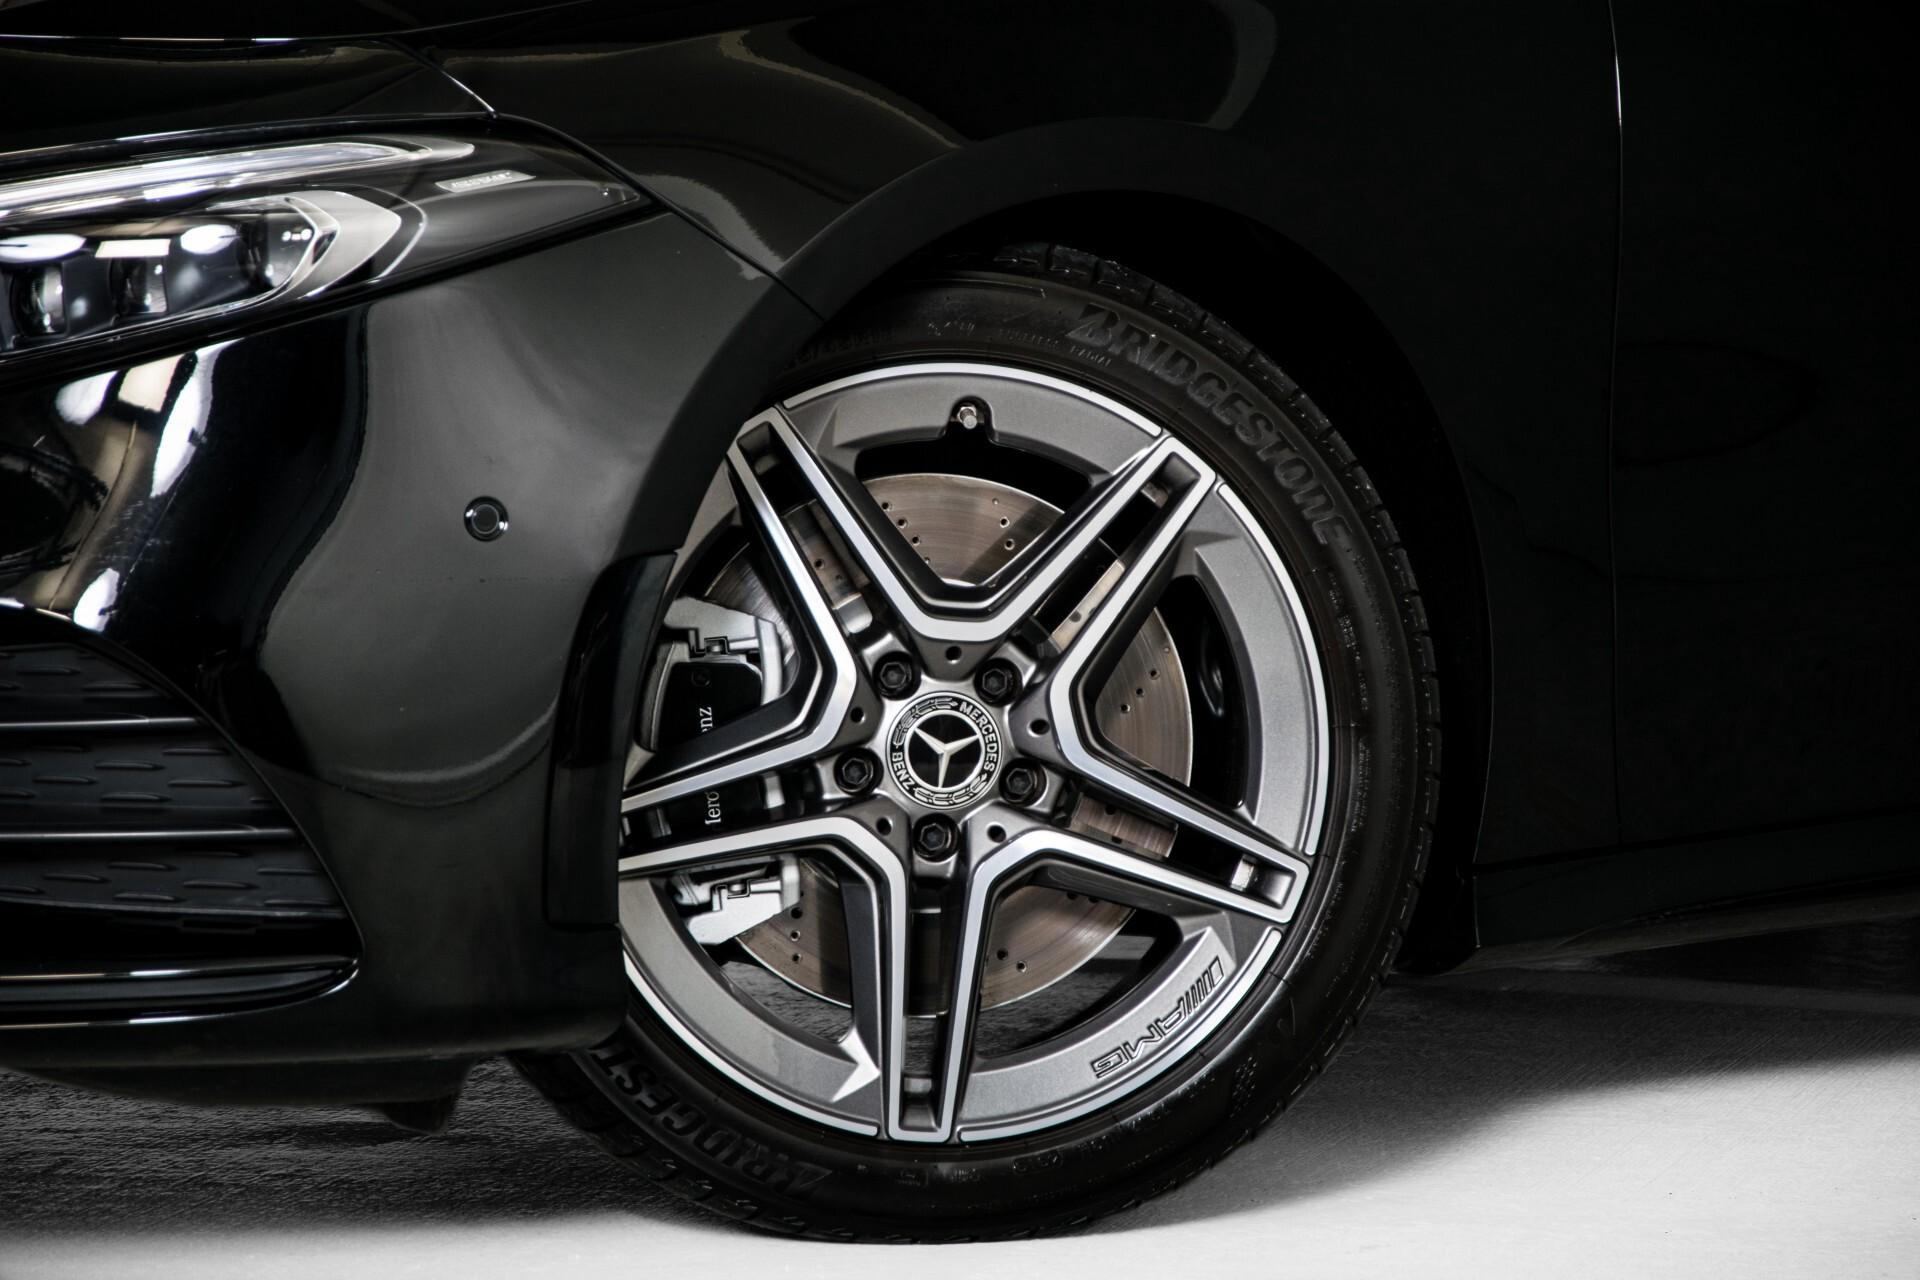 Mercedes-Benz A-Klasse 250 4-M AMG Panorama/Keyless-Entry/MBUX/HUD/Burmester/360/Multibeam LED Aut7 Foto 55